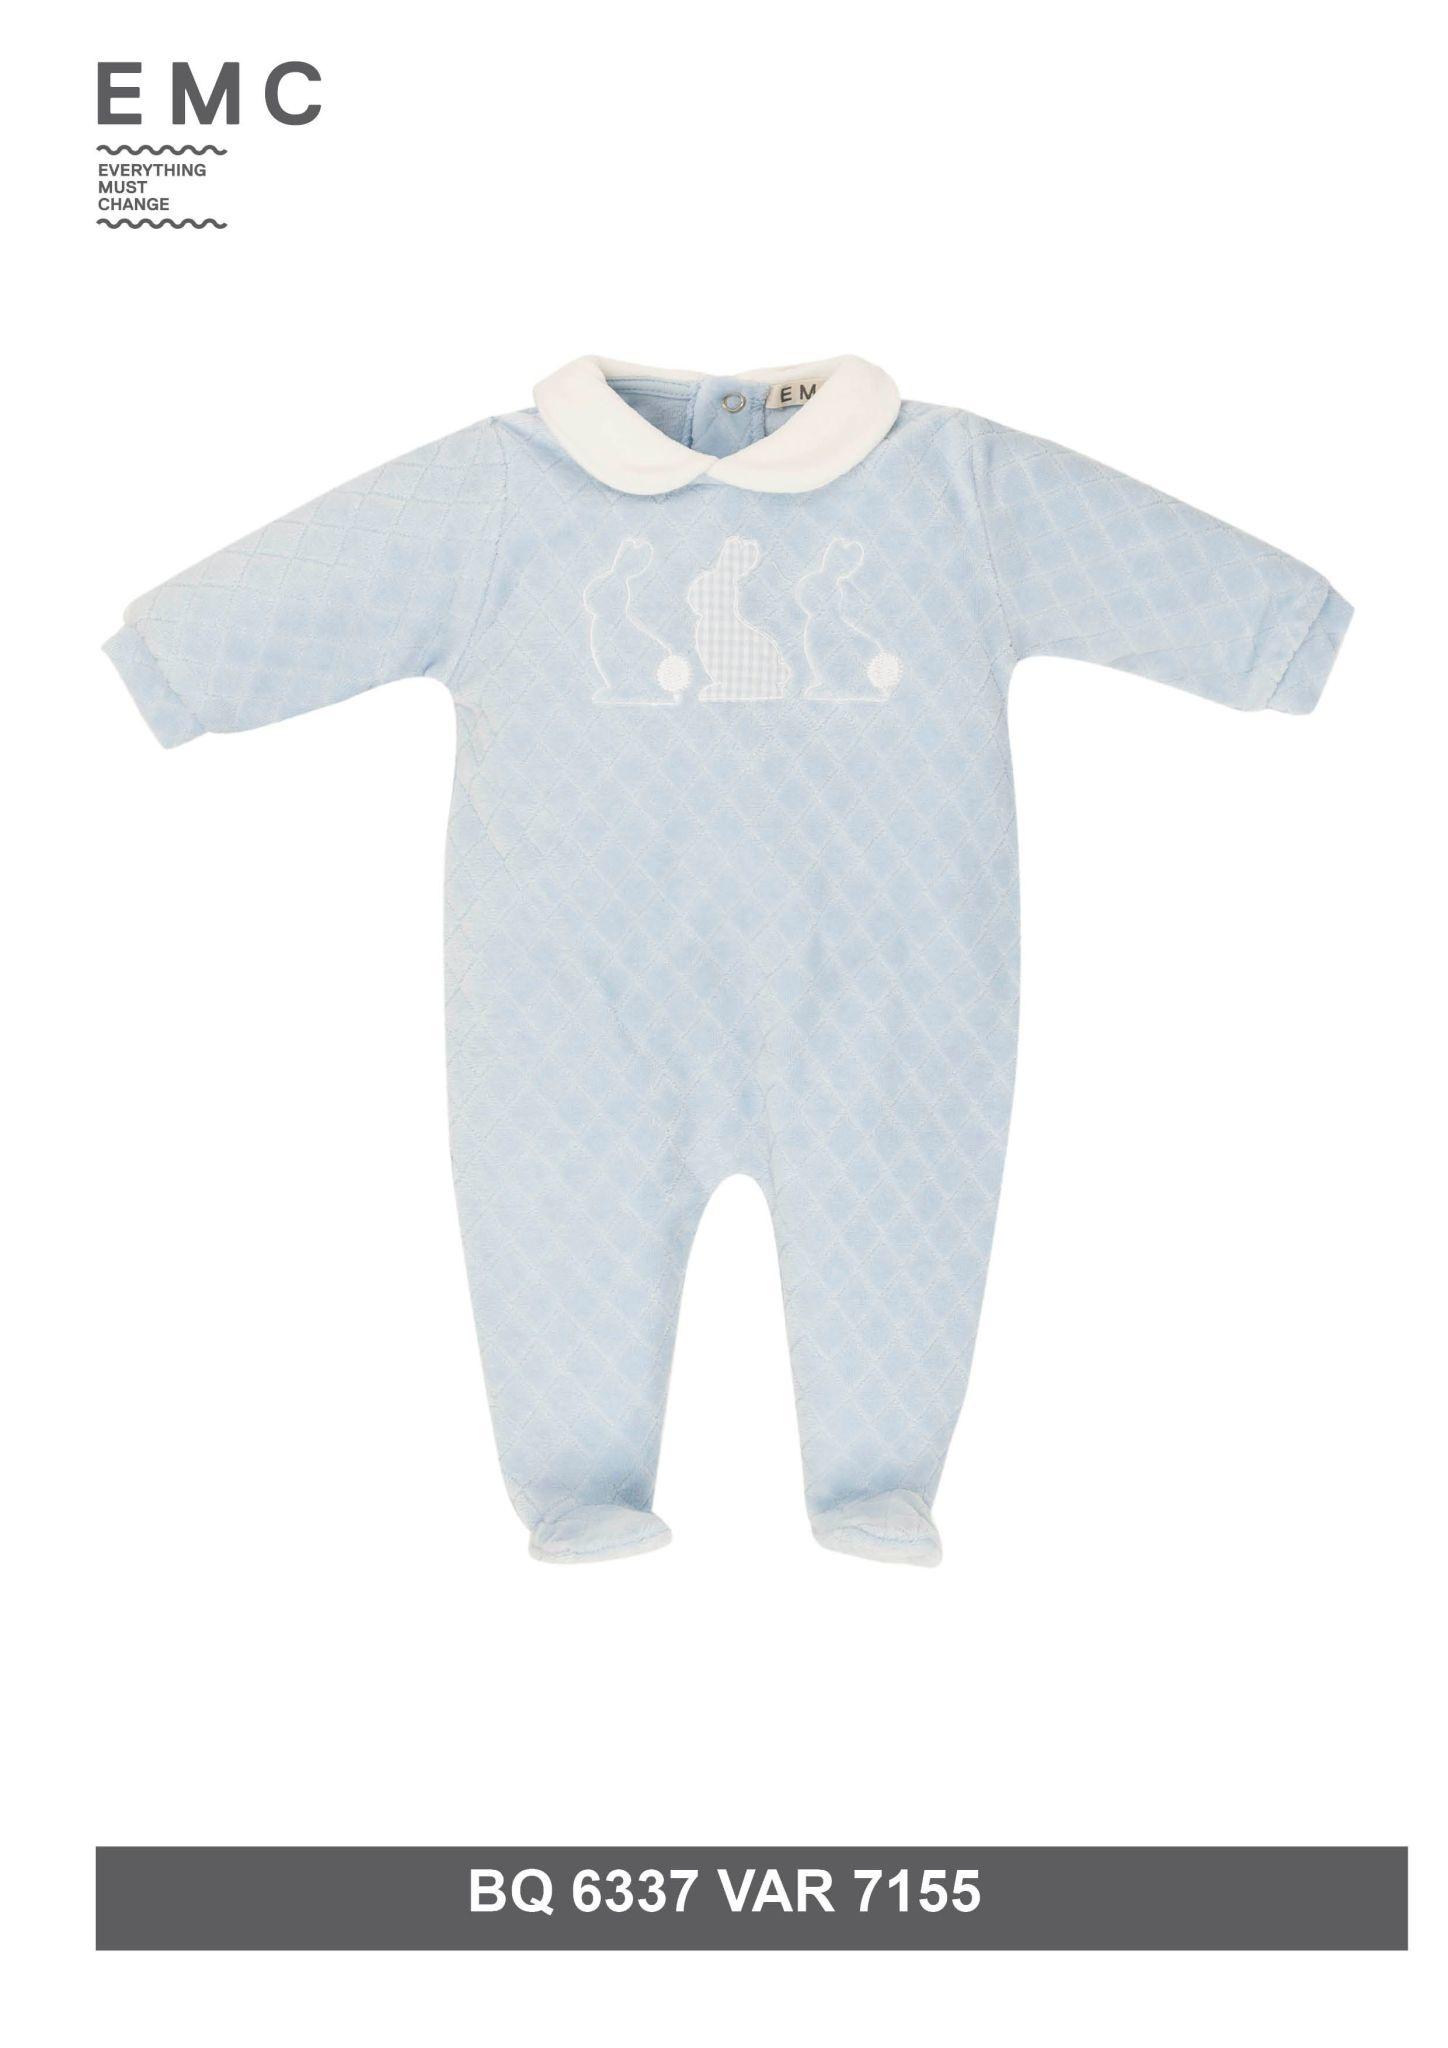 EMC EMC Boys Rabbit Baby Grow 6337